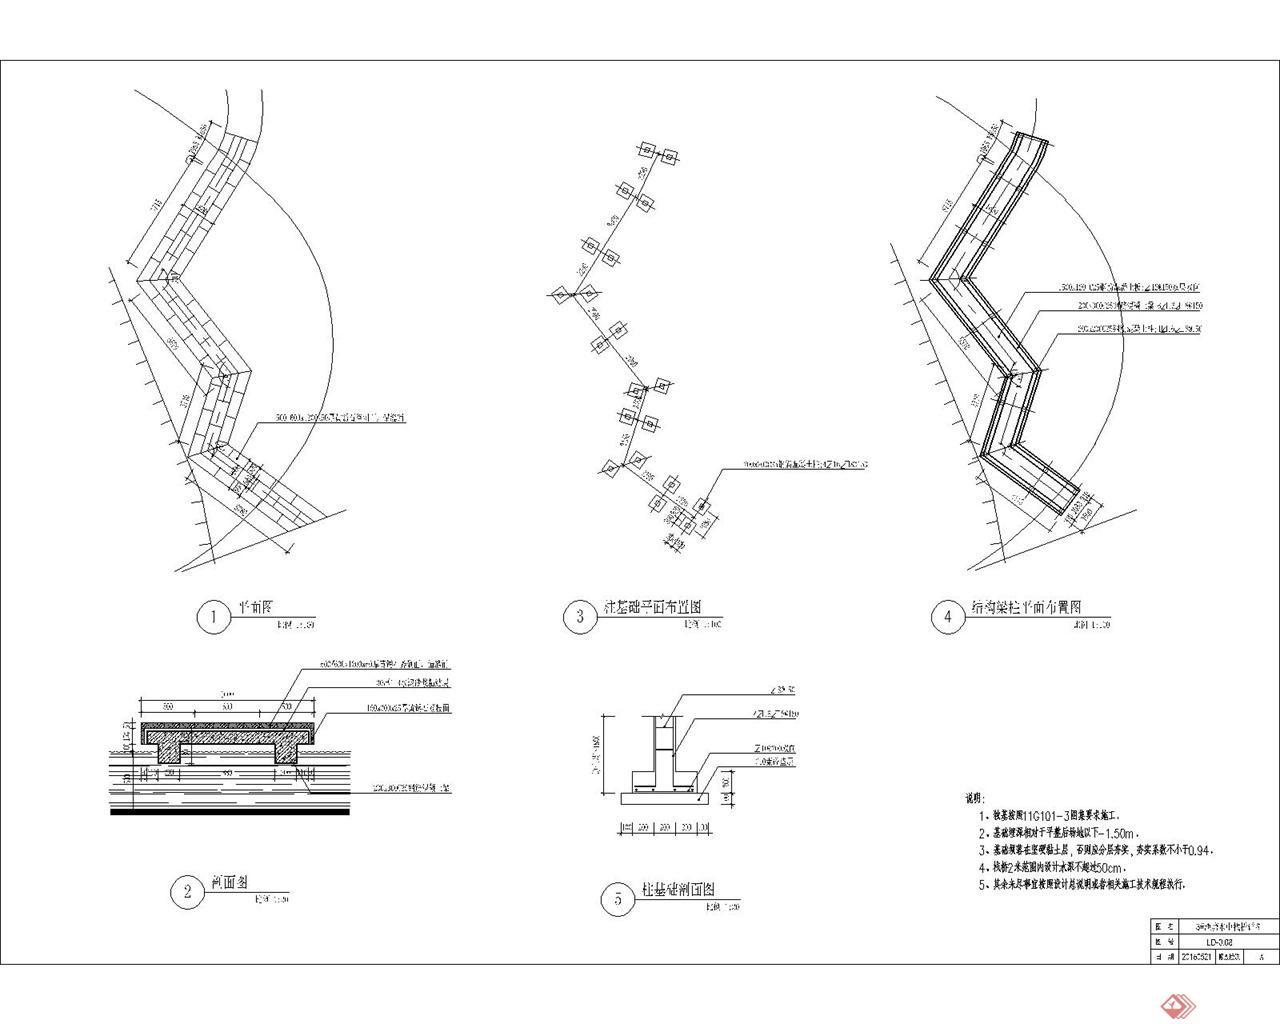 LD-0.08 3#池塘水中栈桥详图-布局1